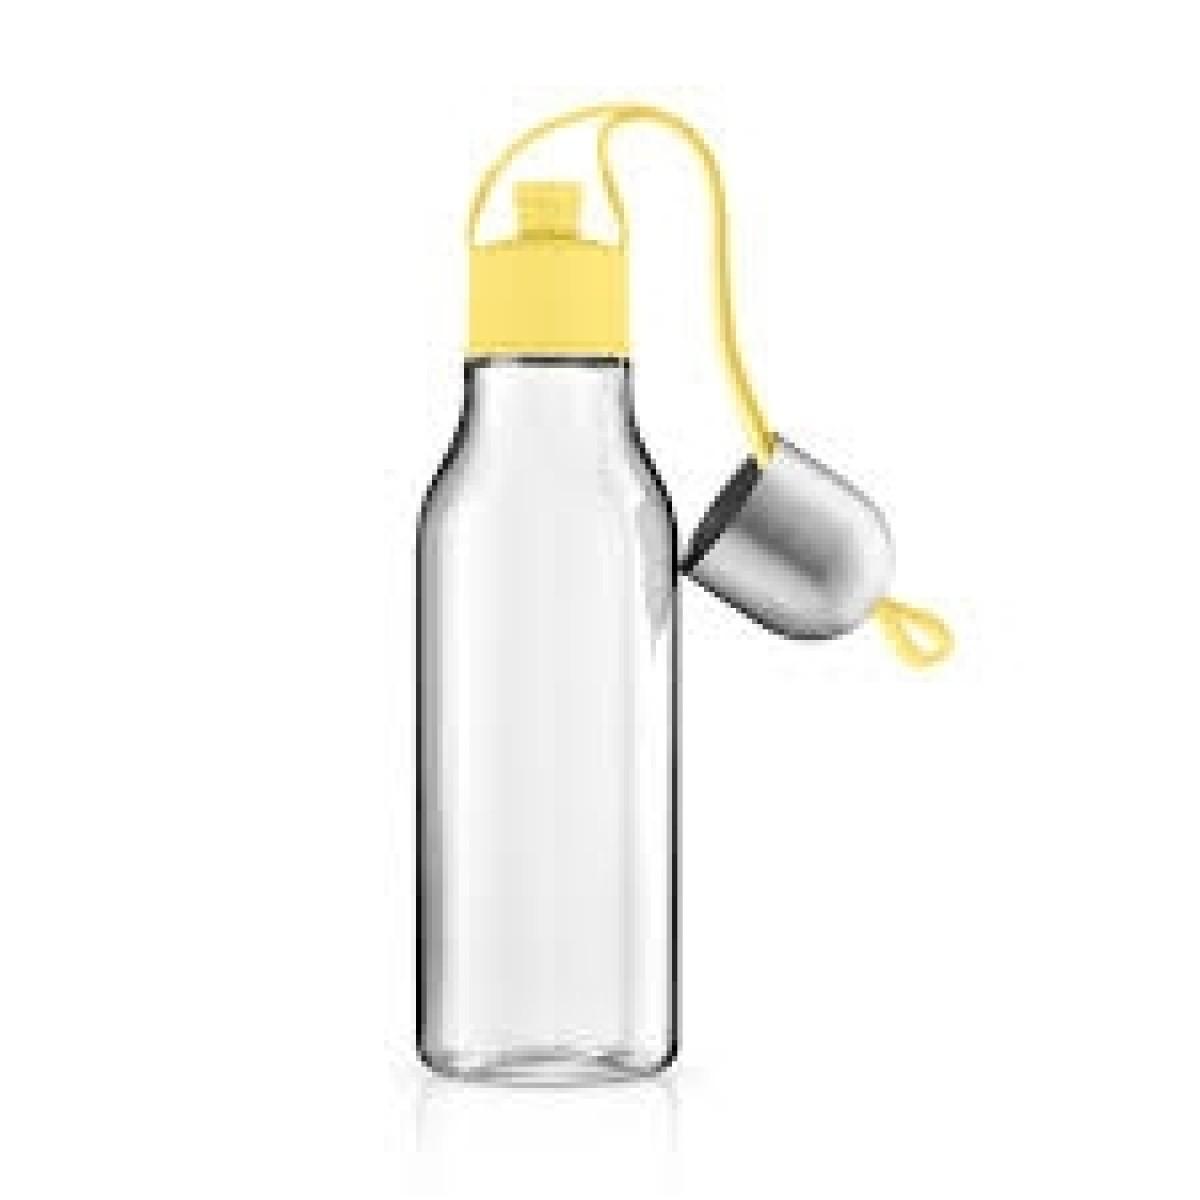 EVASOLOSportsdrikkeflaske07ltr-01